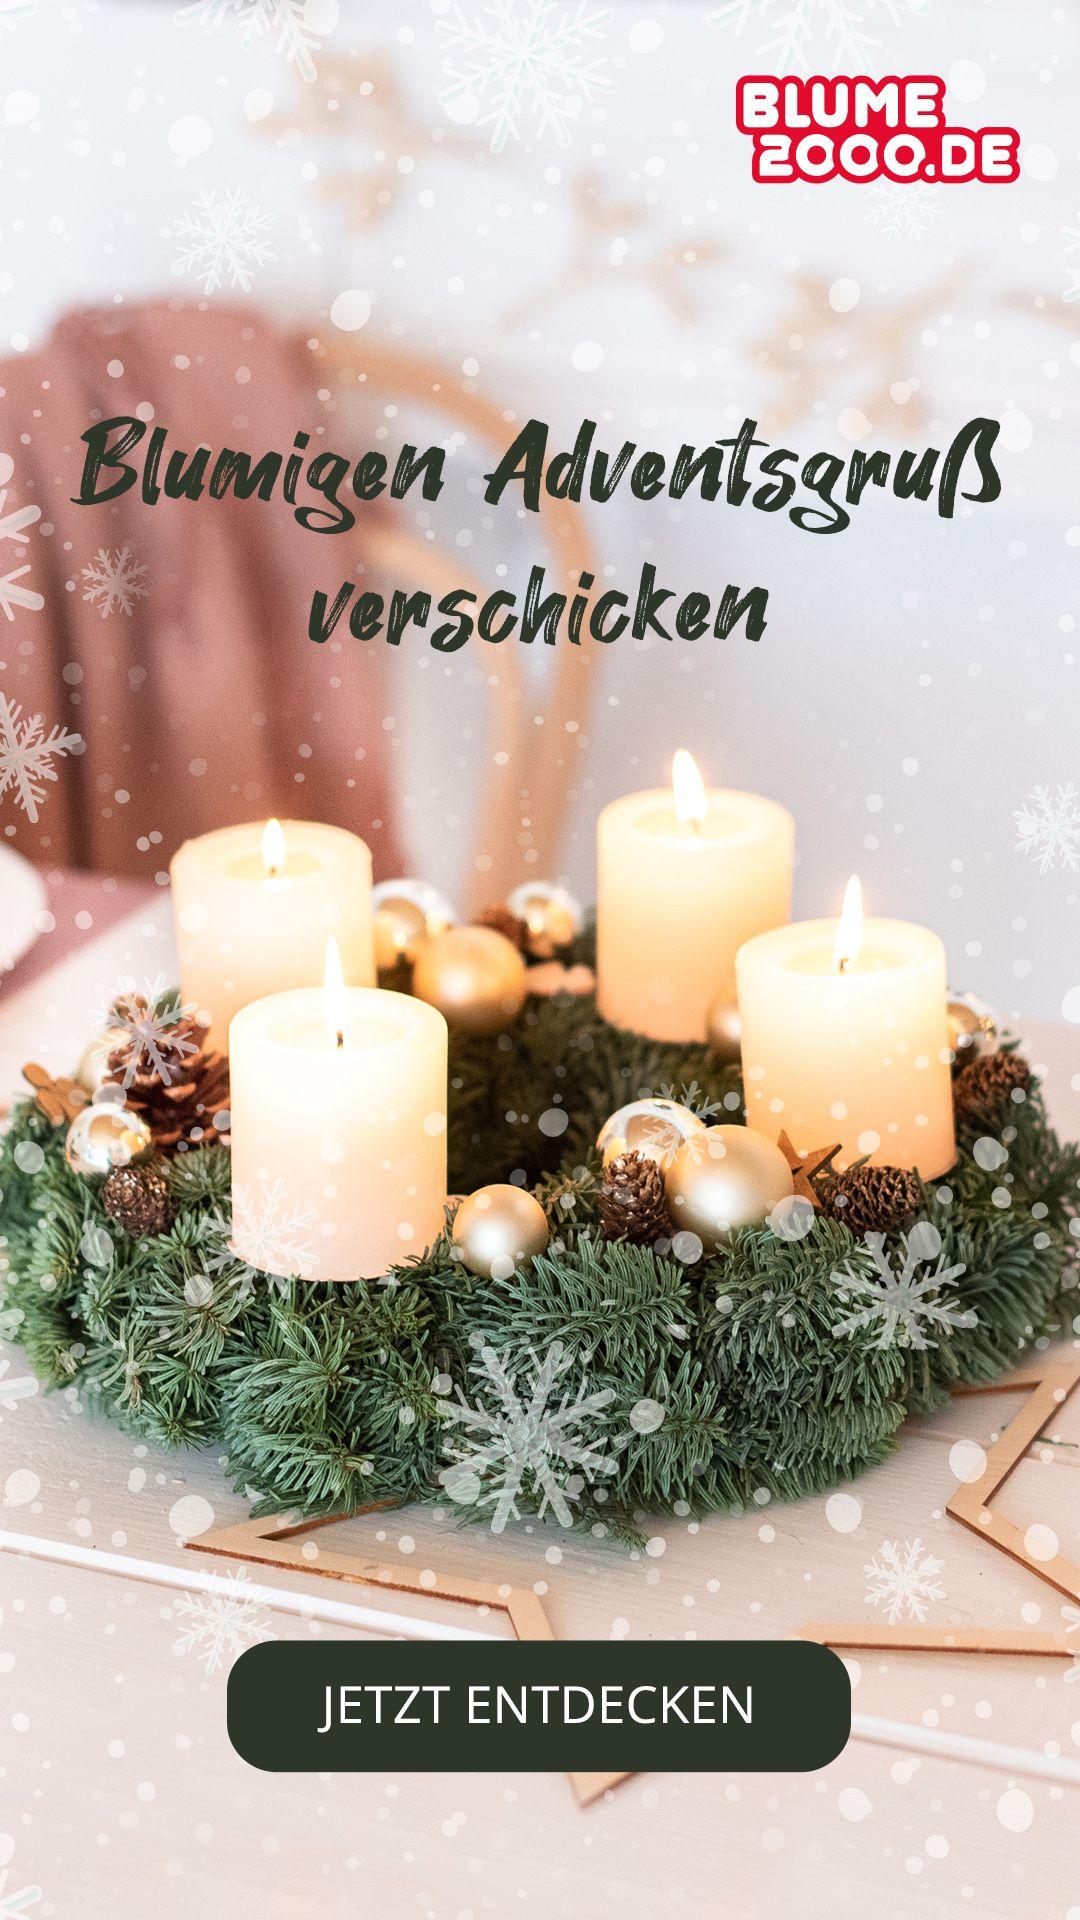 Blumige Adventspost